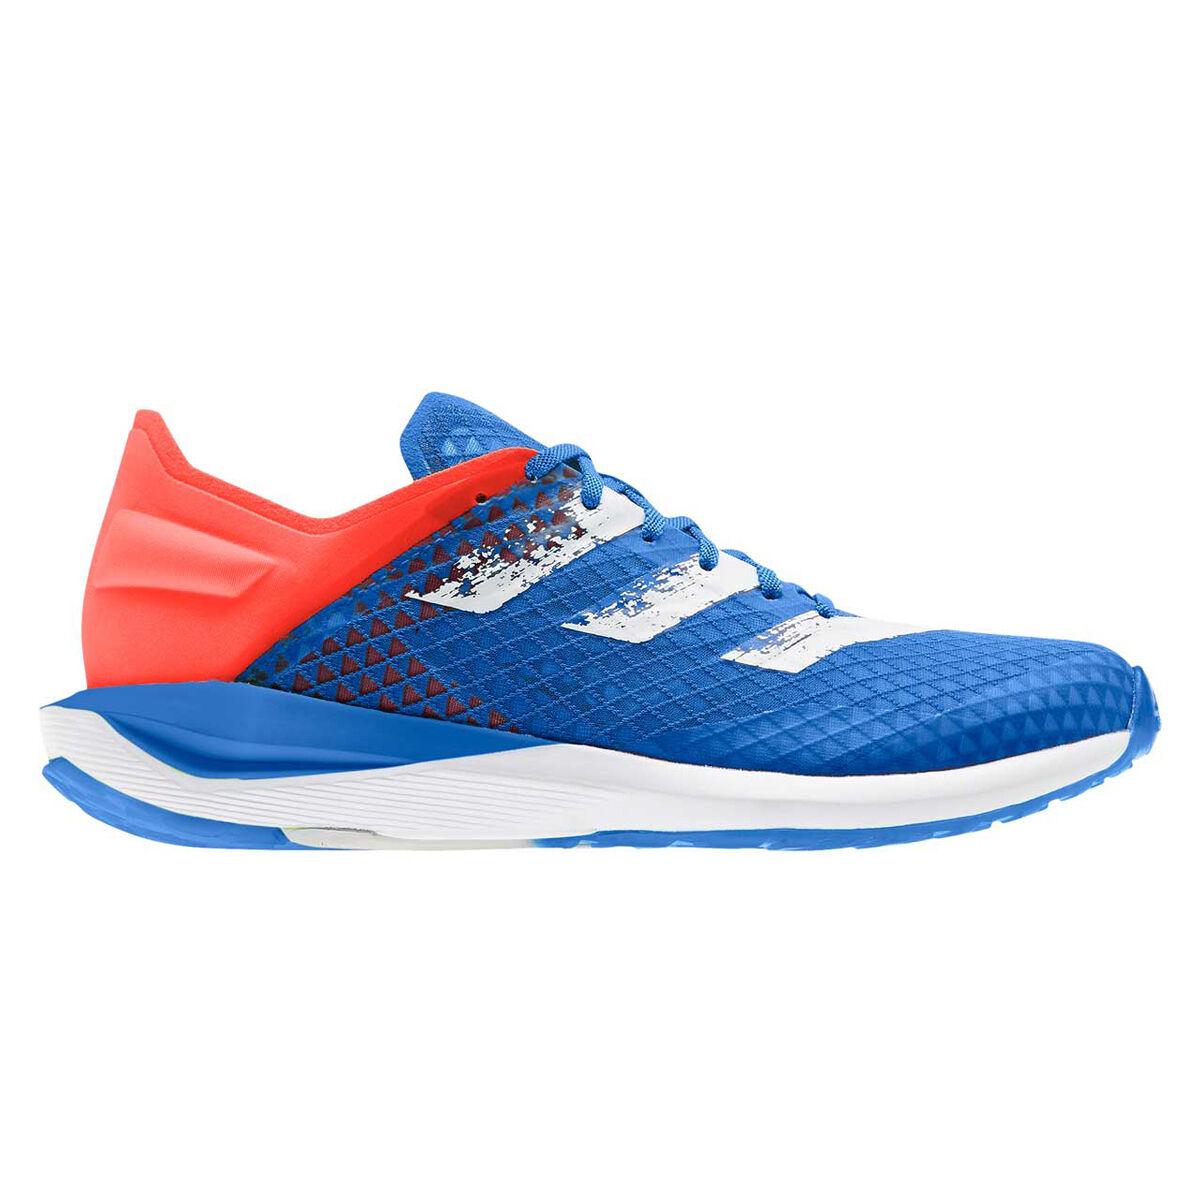 nike wmns free 5.0 women women pink bright blue | adidas RapidaFaito SUMMER.RDY Kids Running Shoes